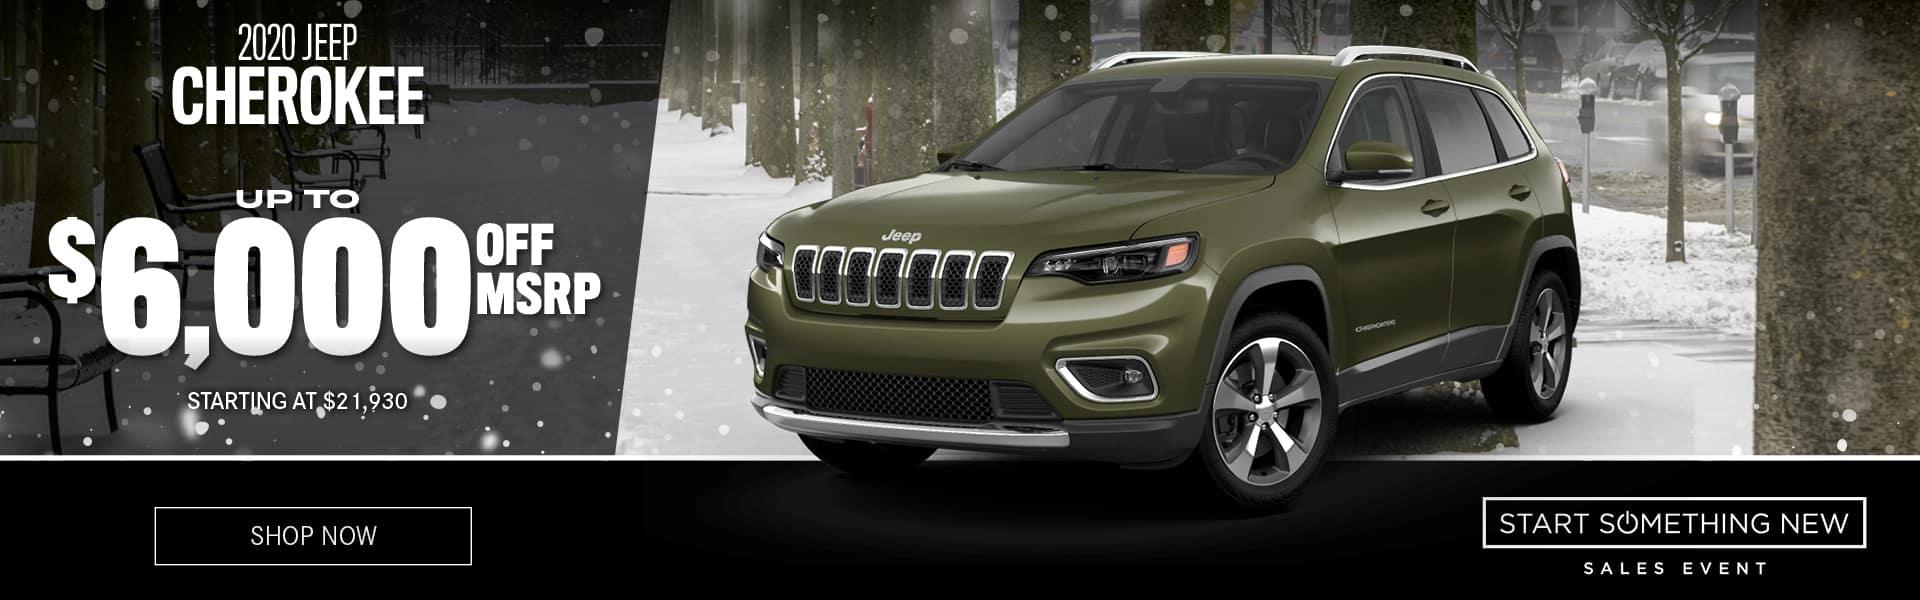 2020 Jeep Cherokee For Sale in Atlanta, Georgia